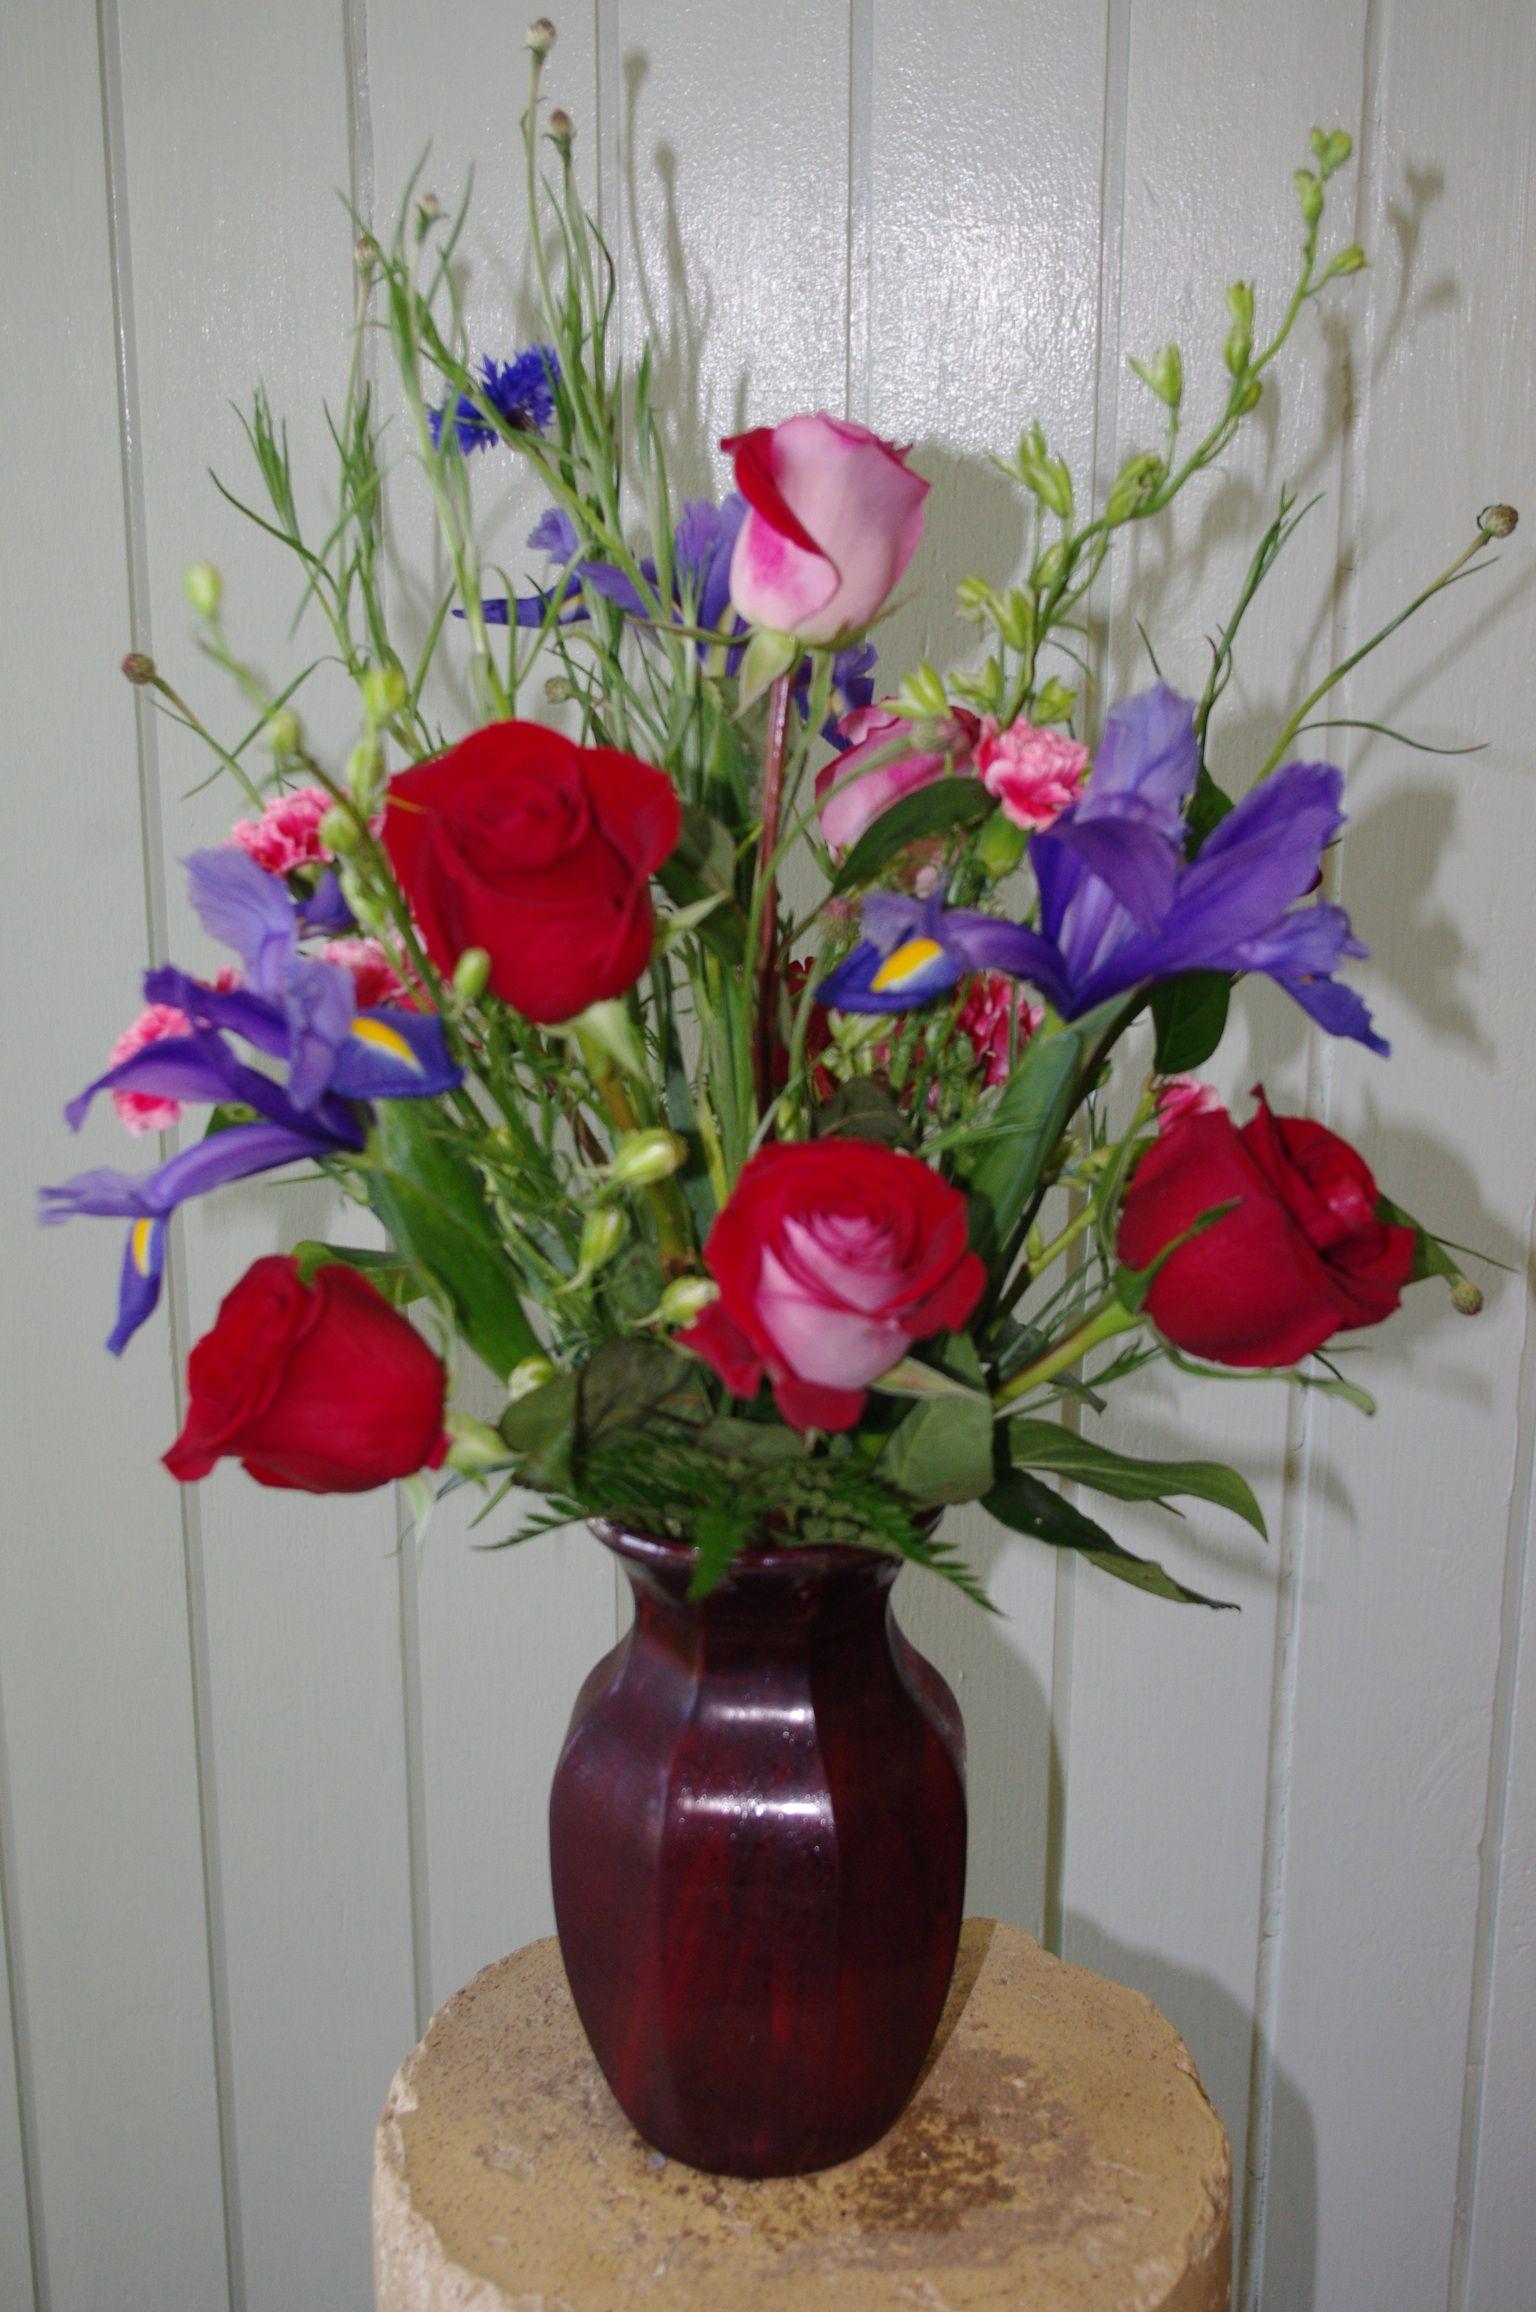 Iris rose floral arrangment good for valentines anytime sweetheart iris rose floral arrangment good for valentines anytime sweetheart just because birthday flowers izmirmasajfo